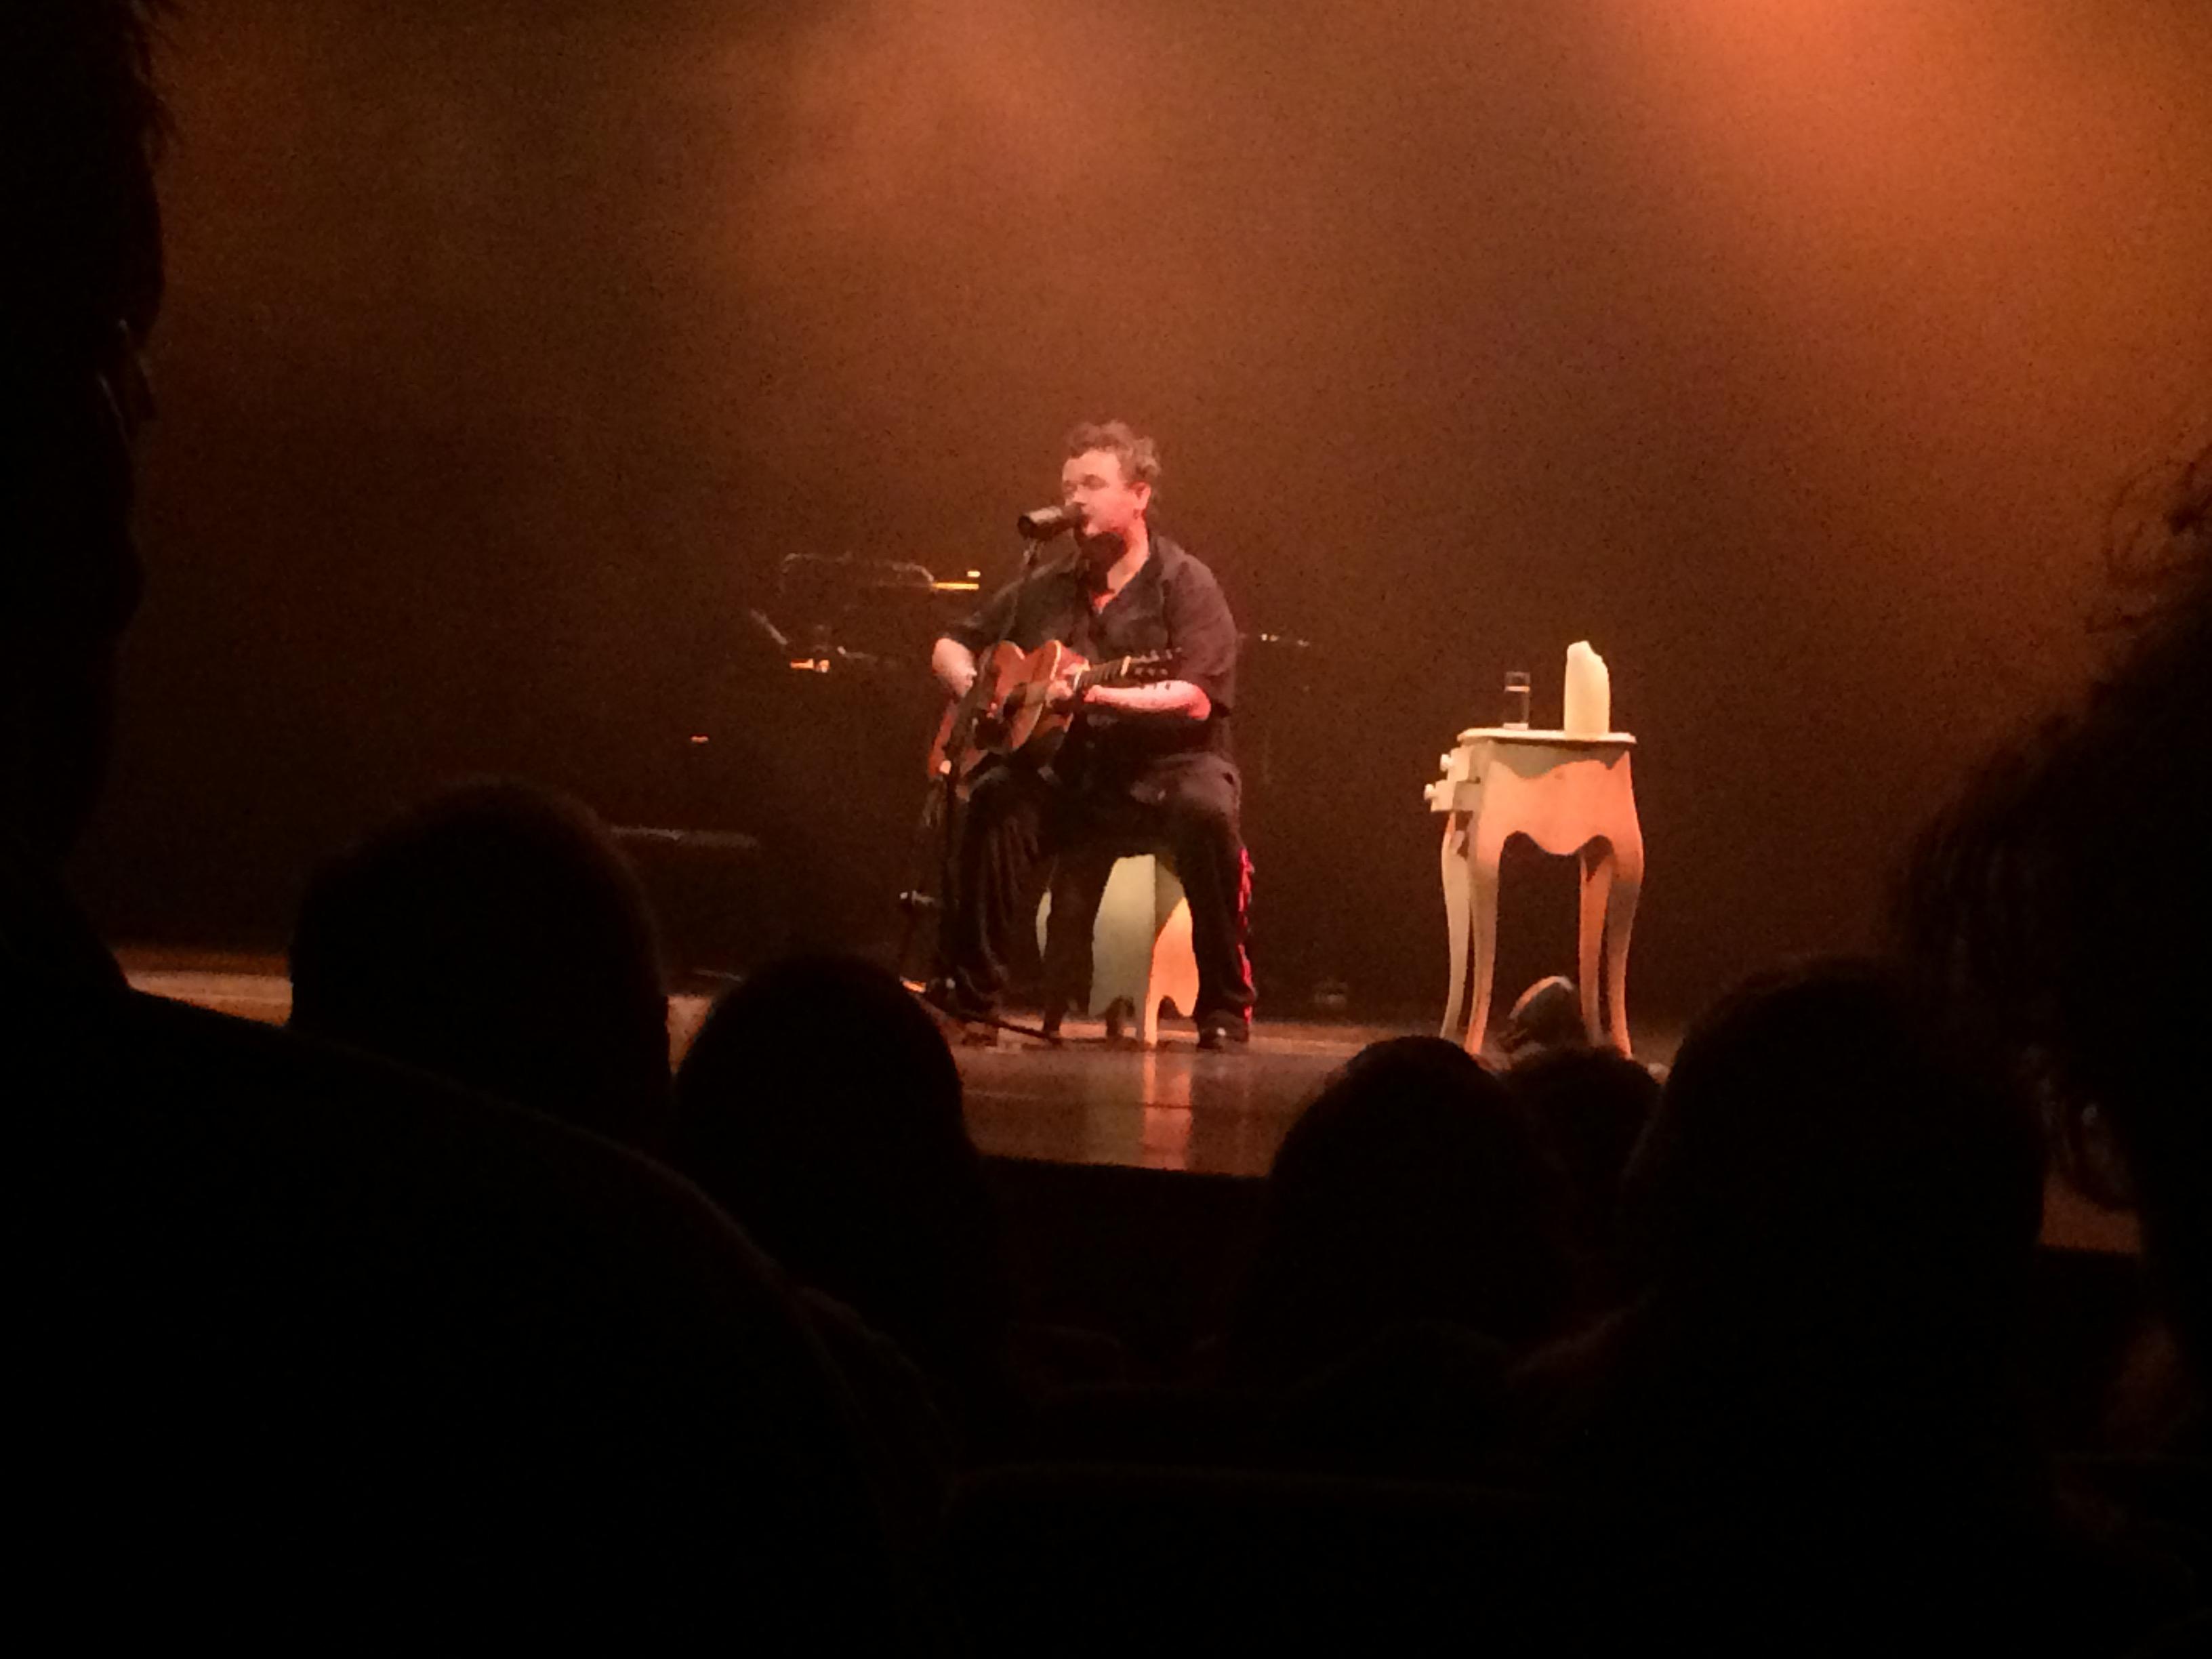 Concertreview: 'As ie oe niet lekker veult moe'j eten'